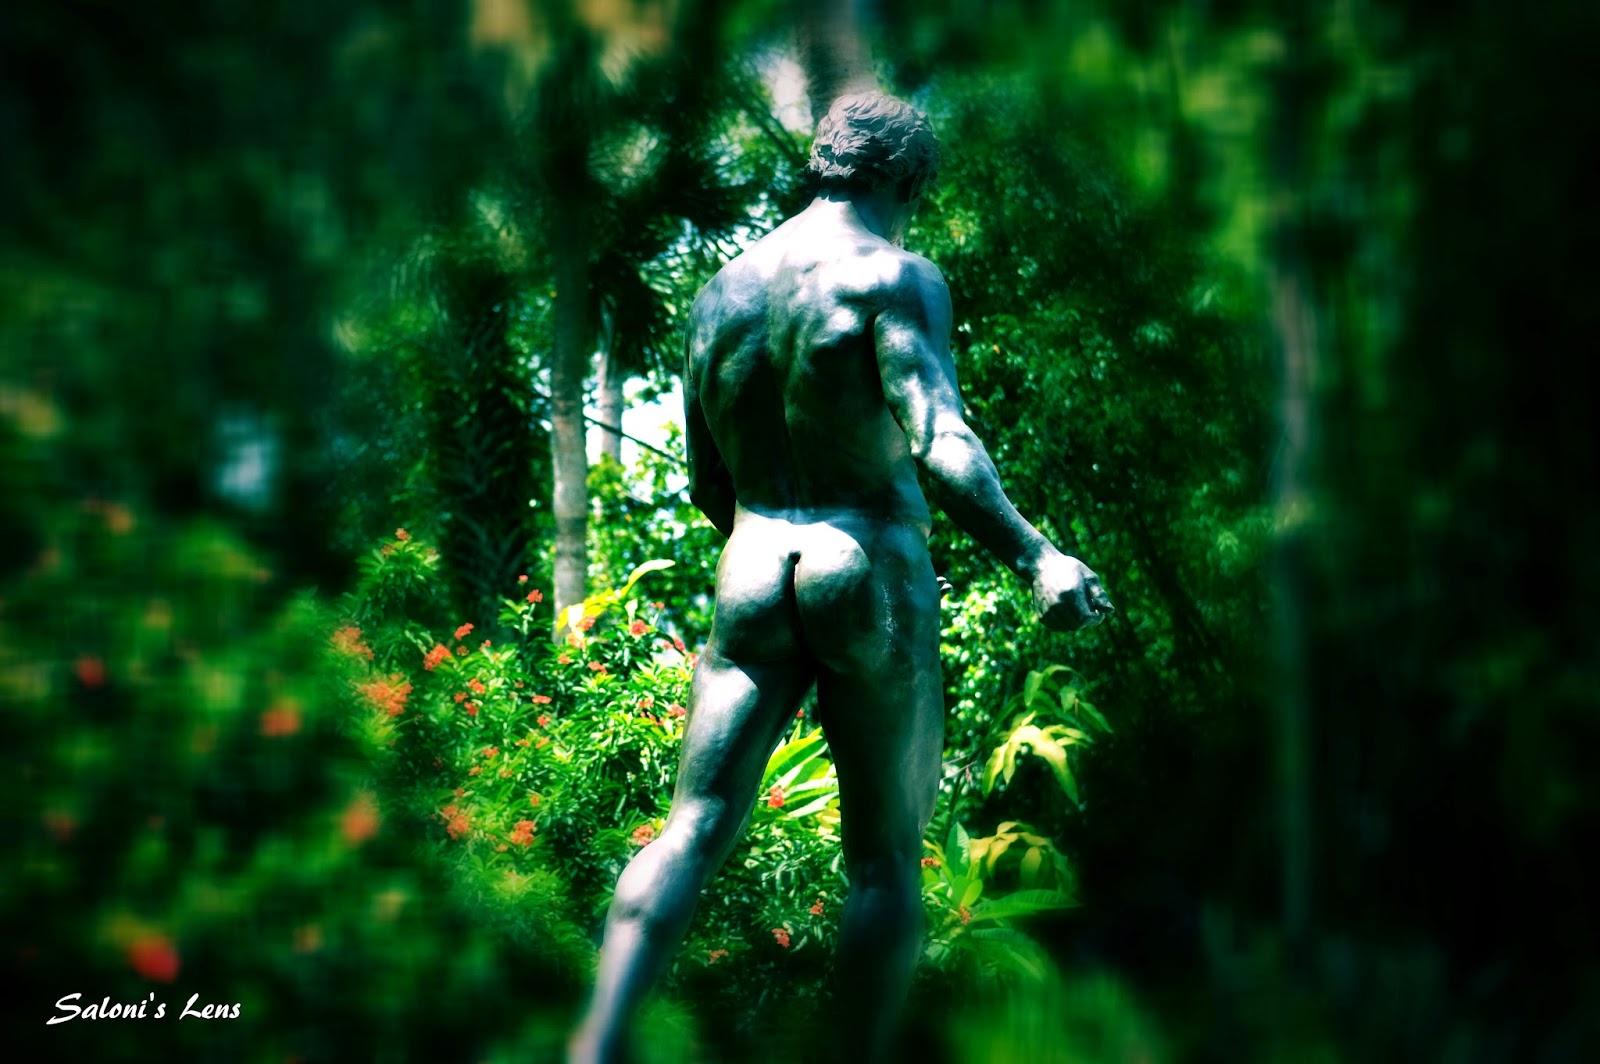 life albin polasek museum and sculpture gardens